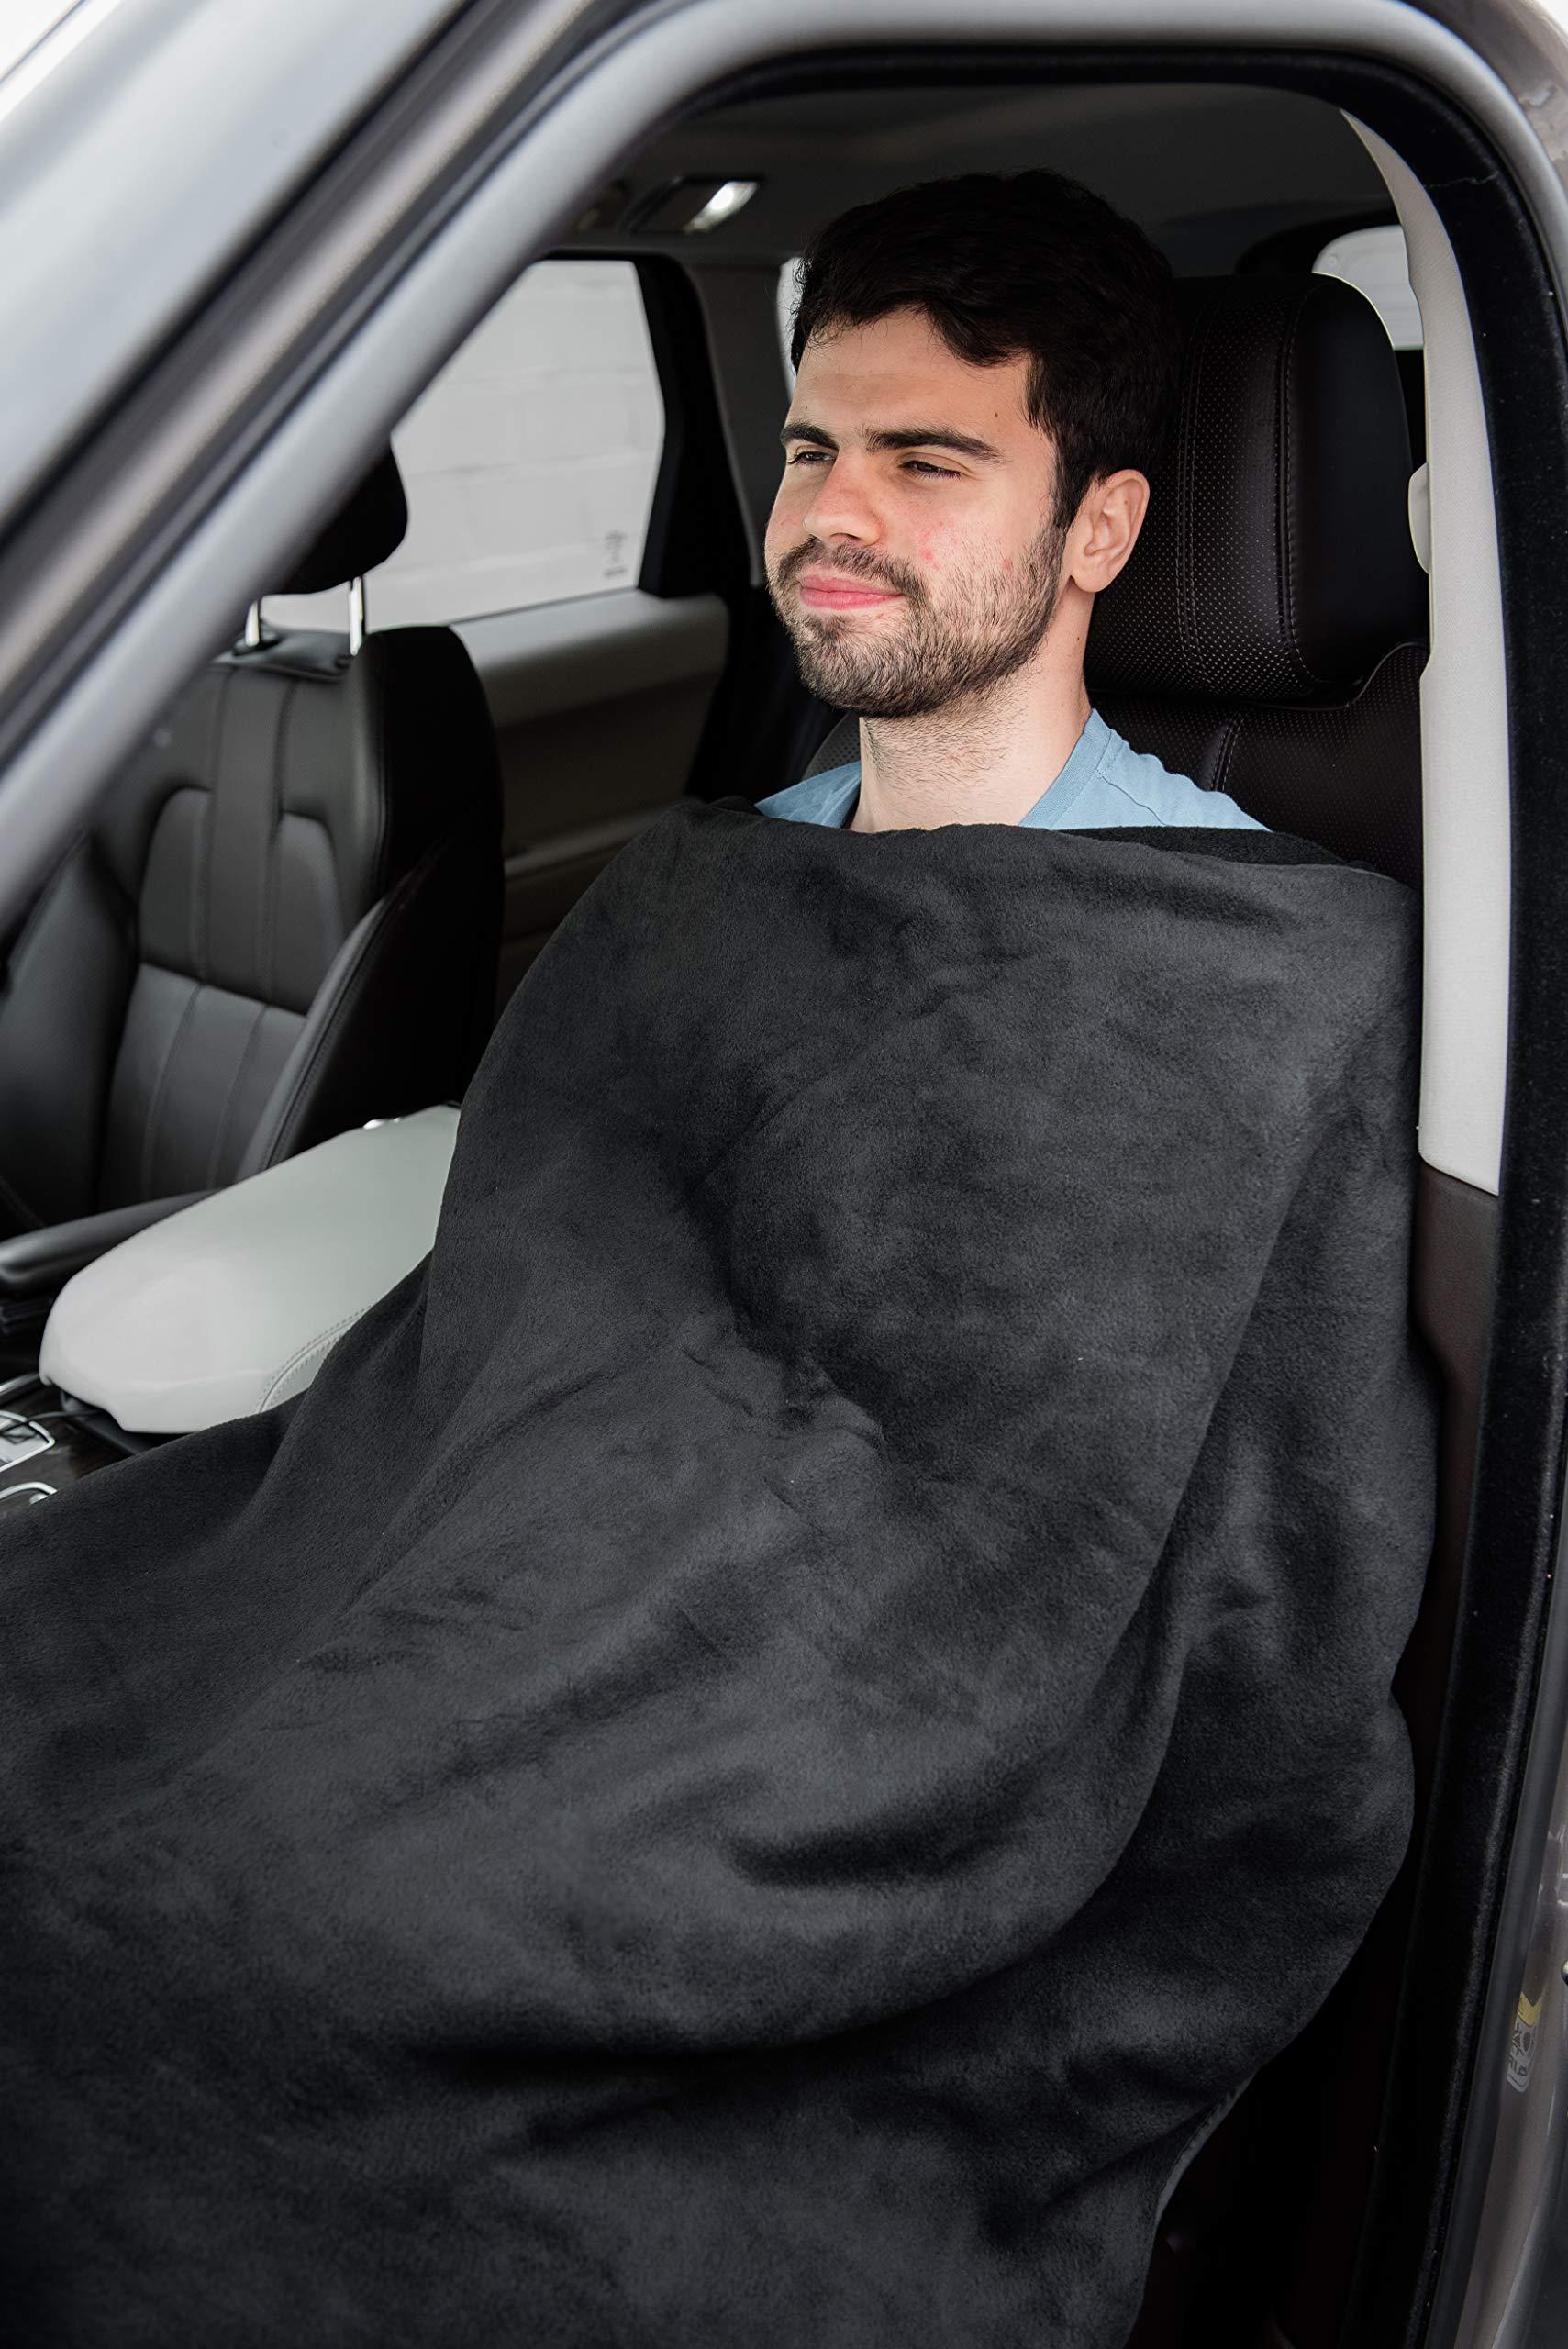 LARGE 12V ELECTRIC HEATED CAR VAN TRUCK POLAR FLEECE COZY WARM TRAVEL BLANKET